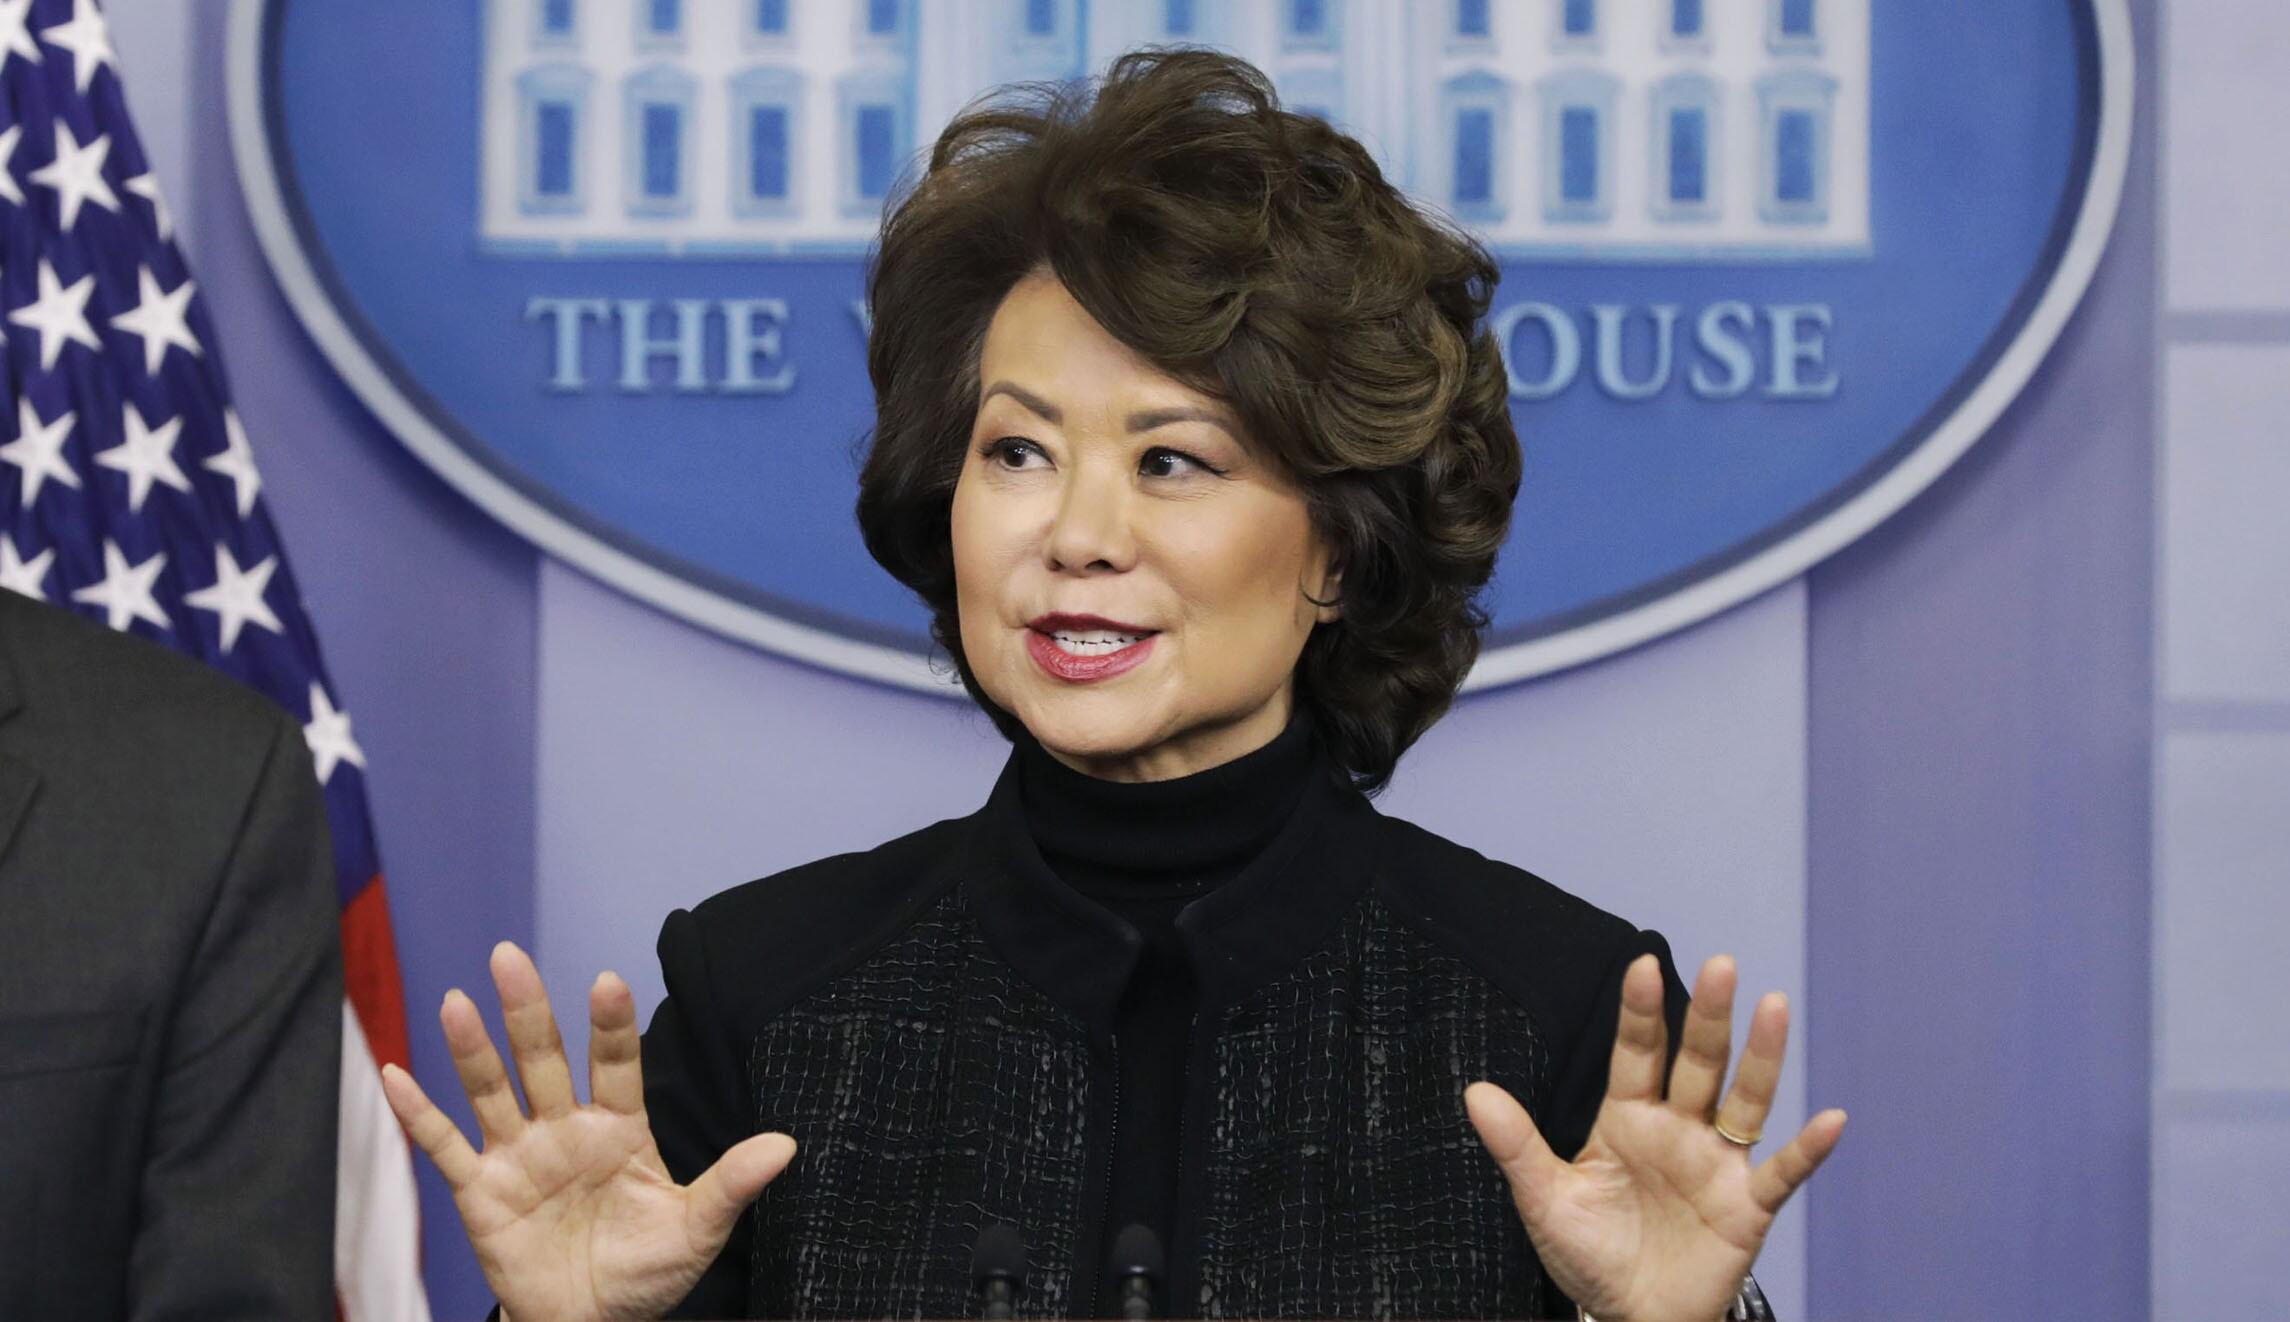 U.S. Transportation Secretary Elaine Chao Speaks During White House Press Briefing